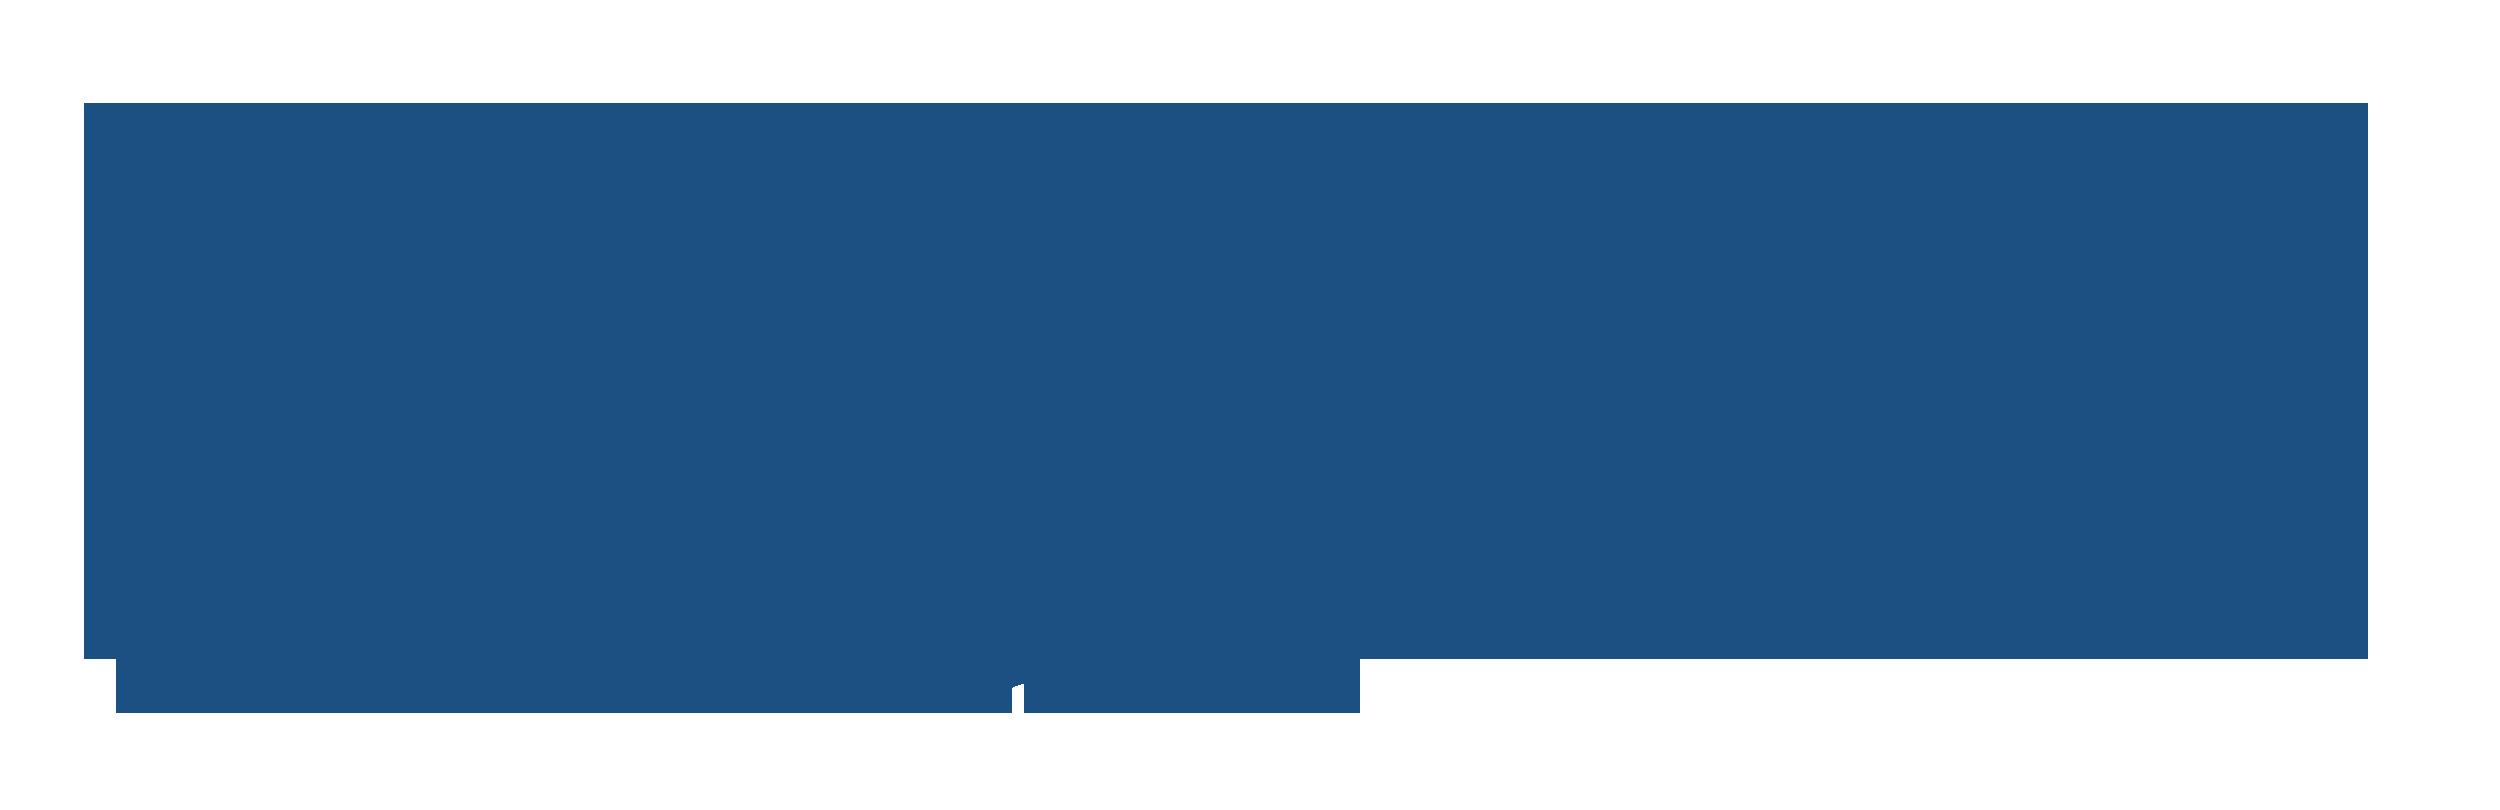 Smooth Digital